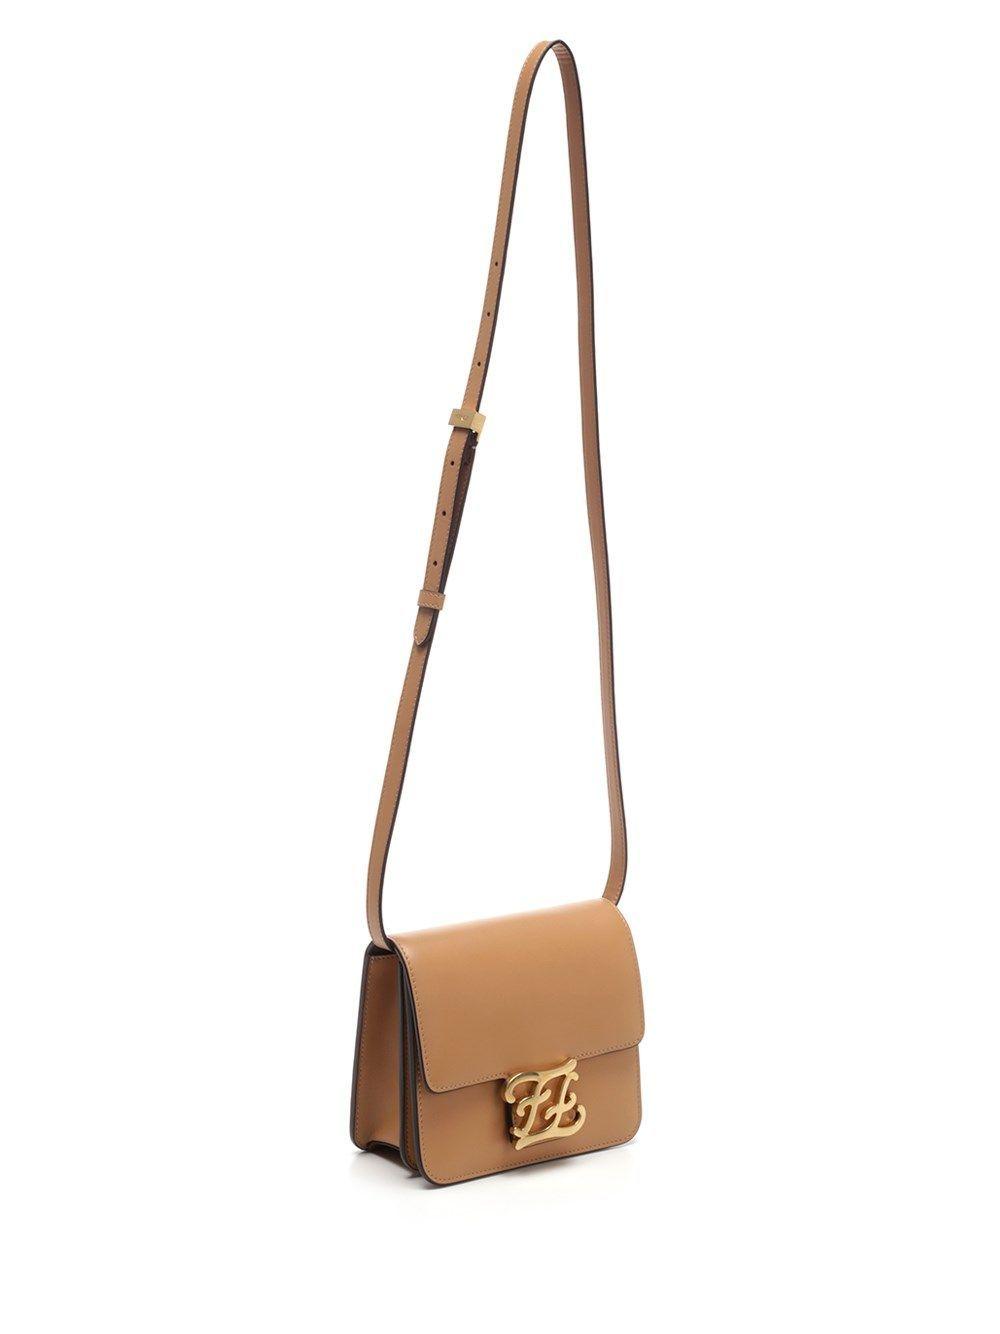 FENDI WOMEN'S 8BT317AAIWF1A13 BEIGE LEATHER SHOULDER BAG